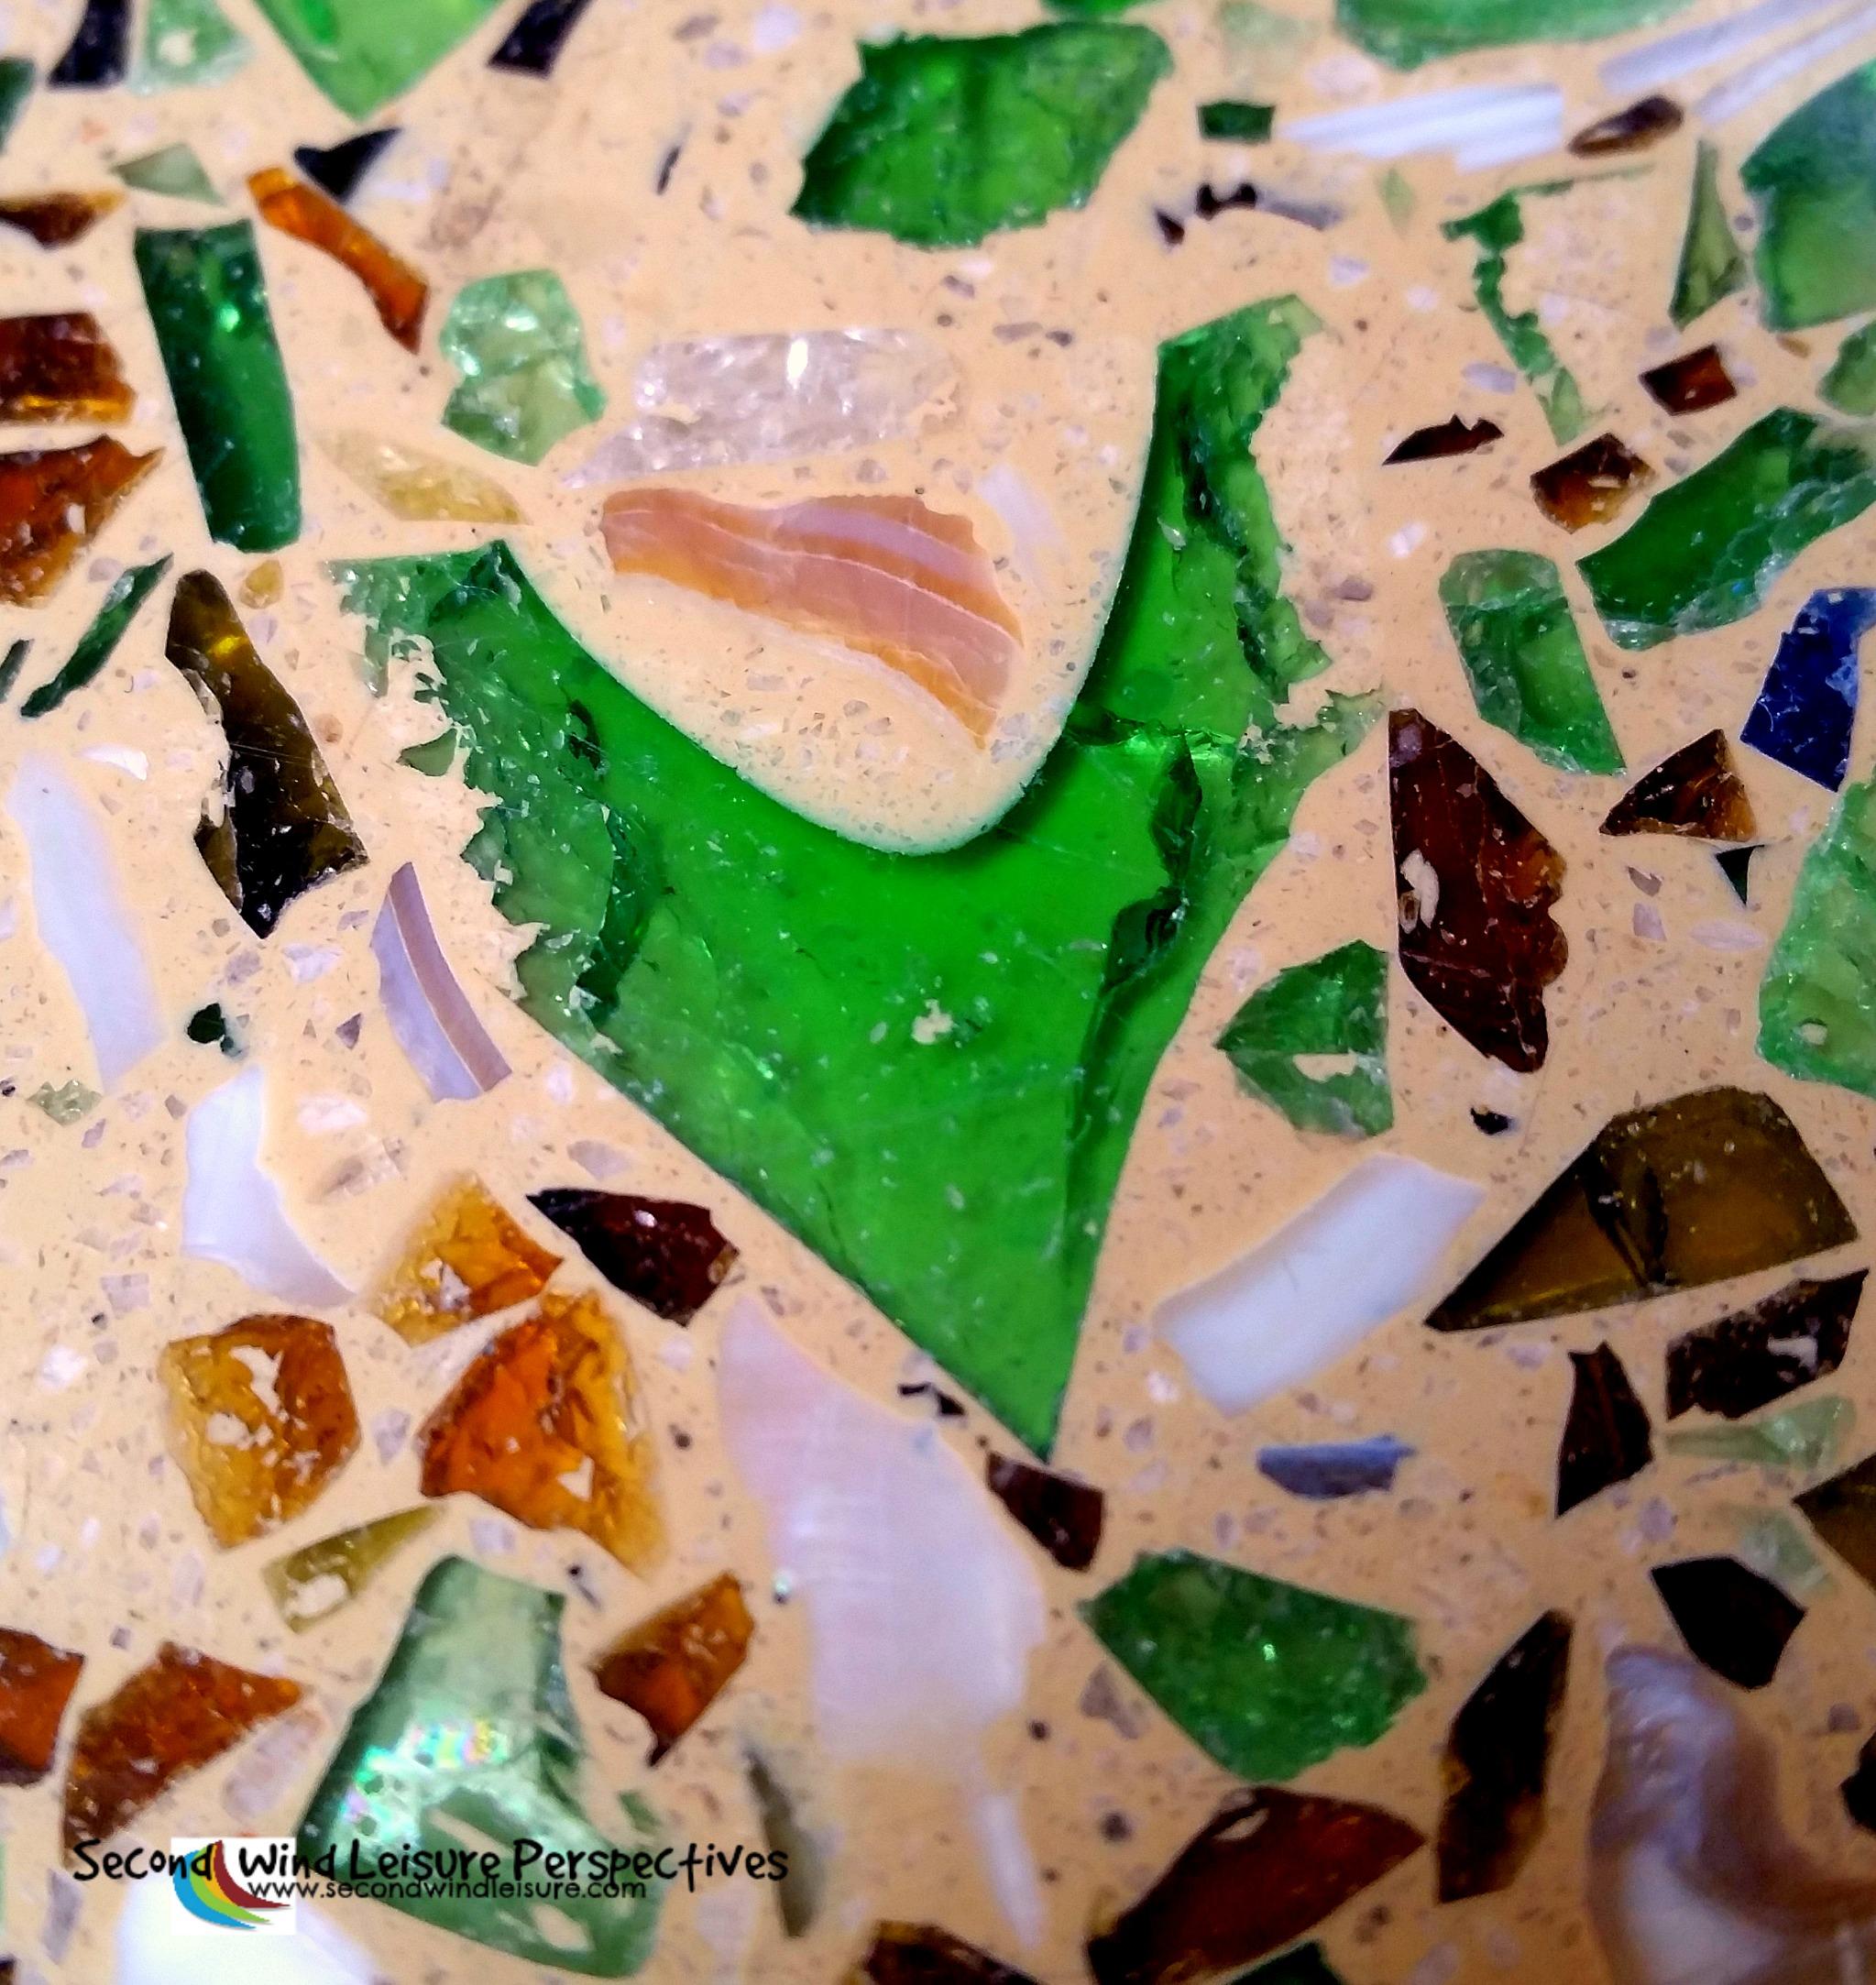 The green bits in the terrazzo floor are crushed, recycled Heineken beer bottles.